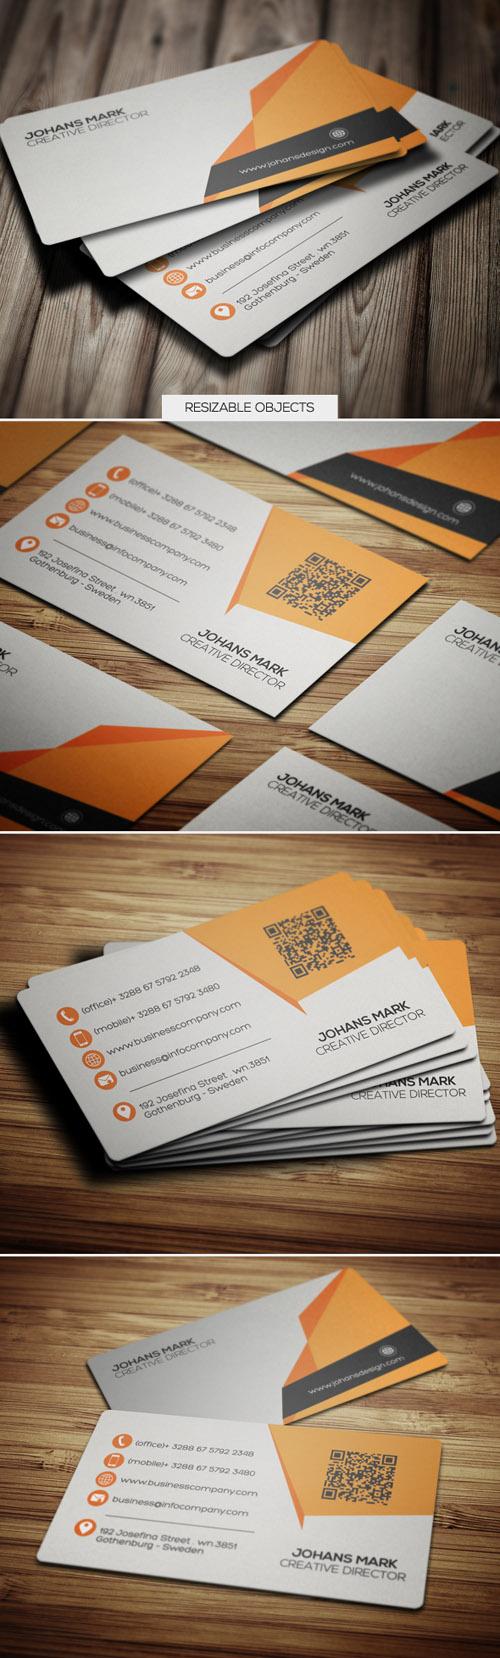 business cards template design - 26